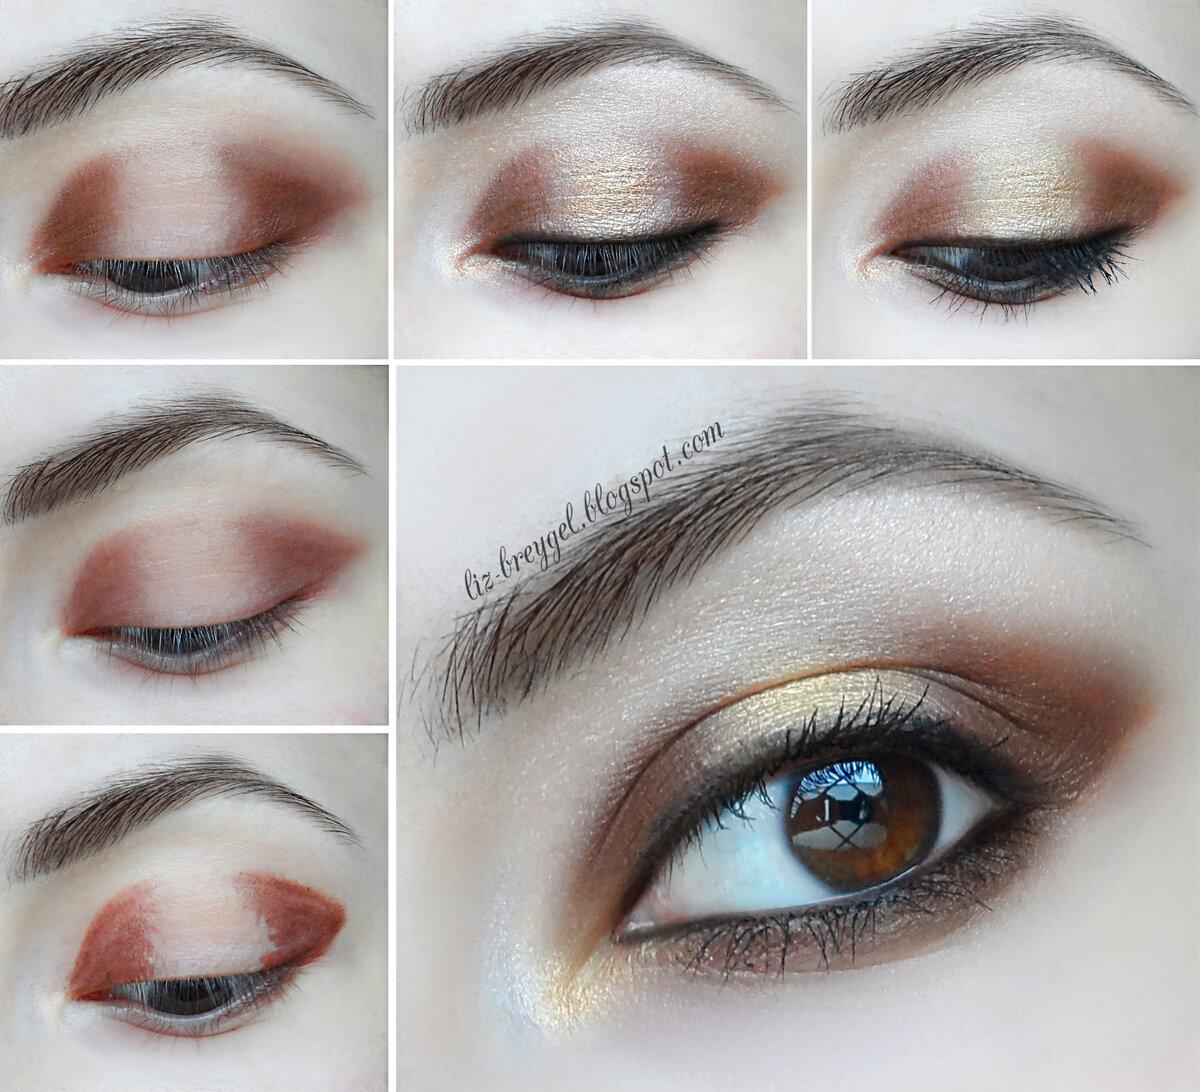 тому подача техники макияжа глаз в картинках хорошо